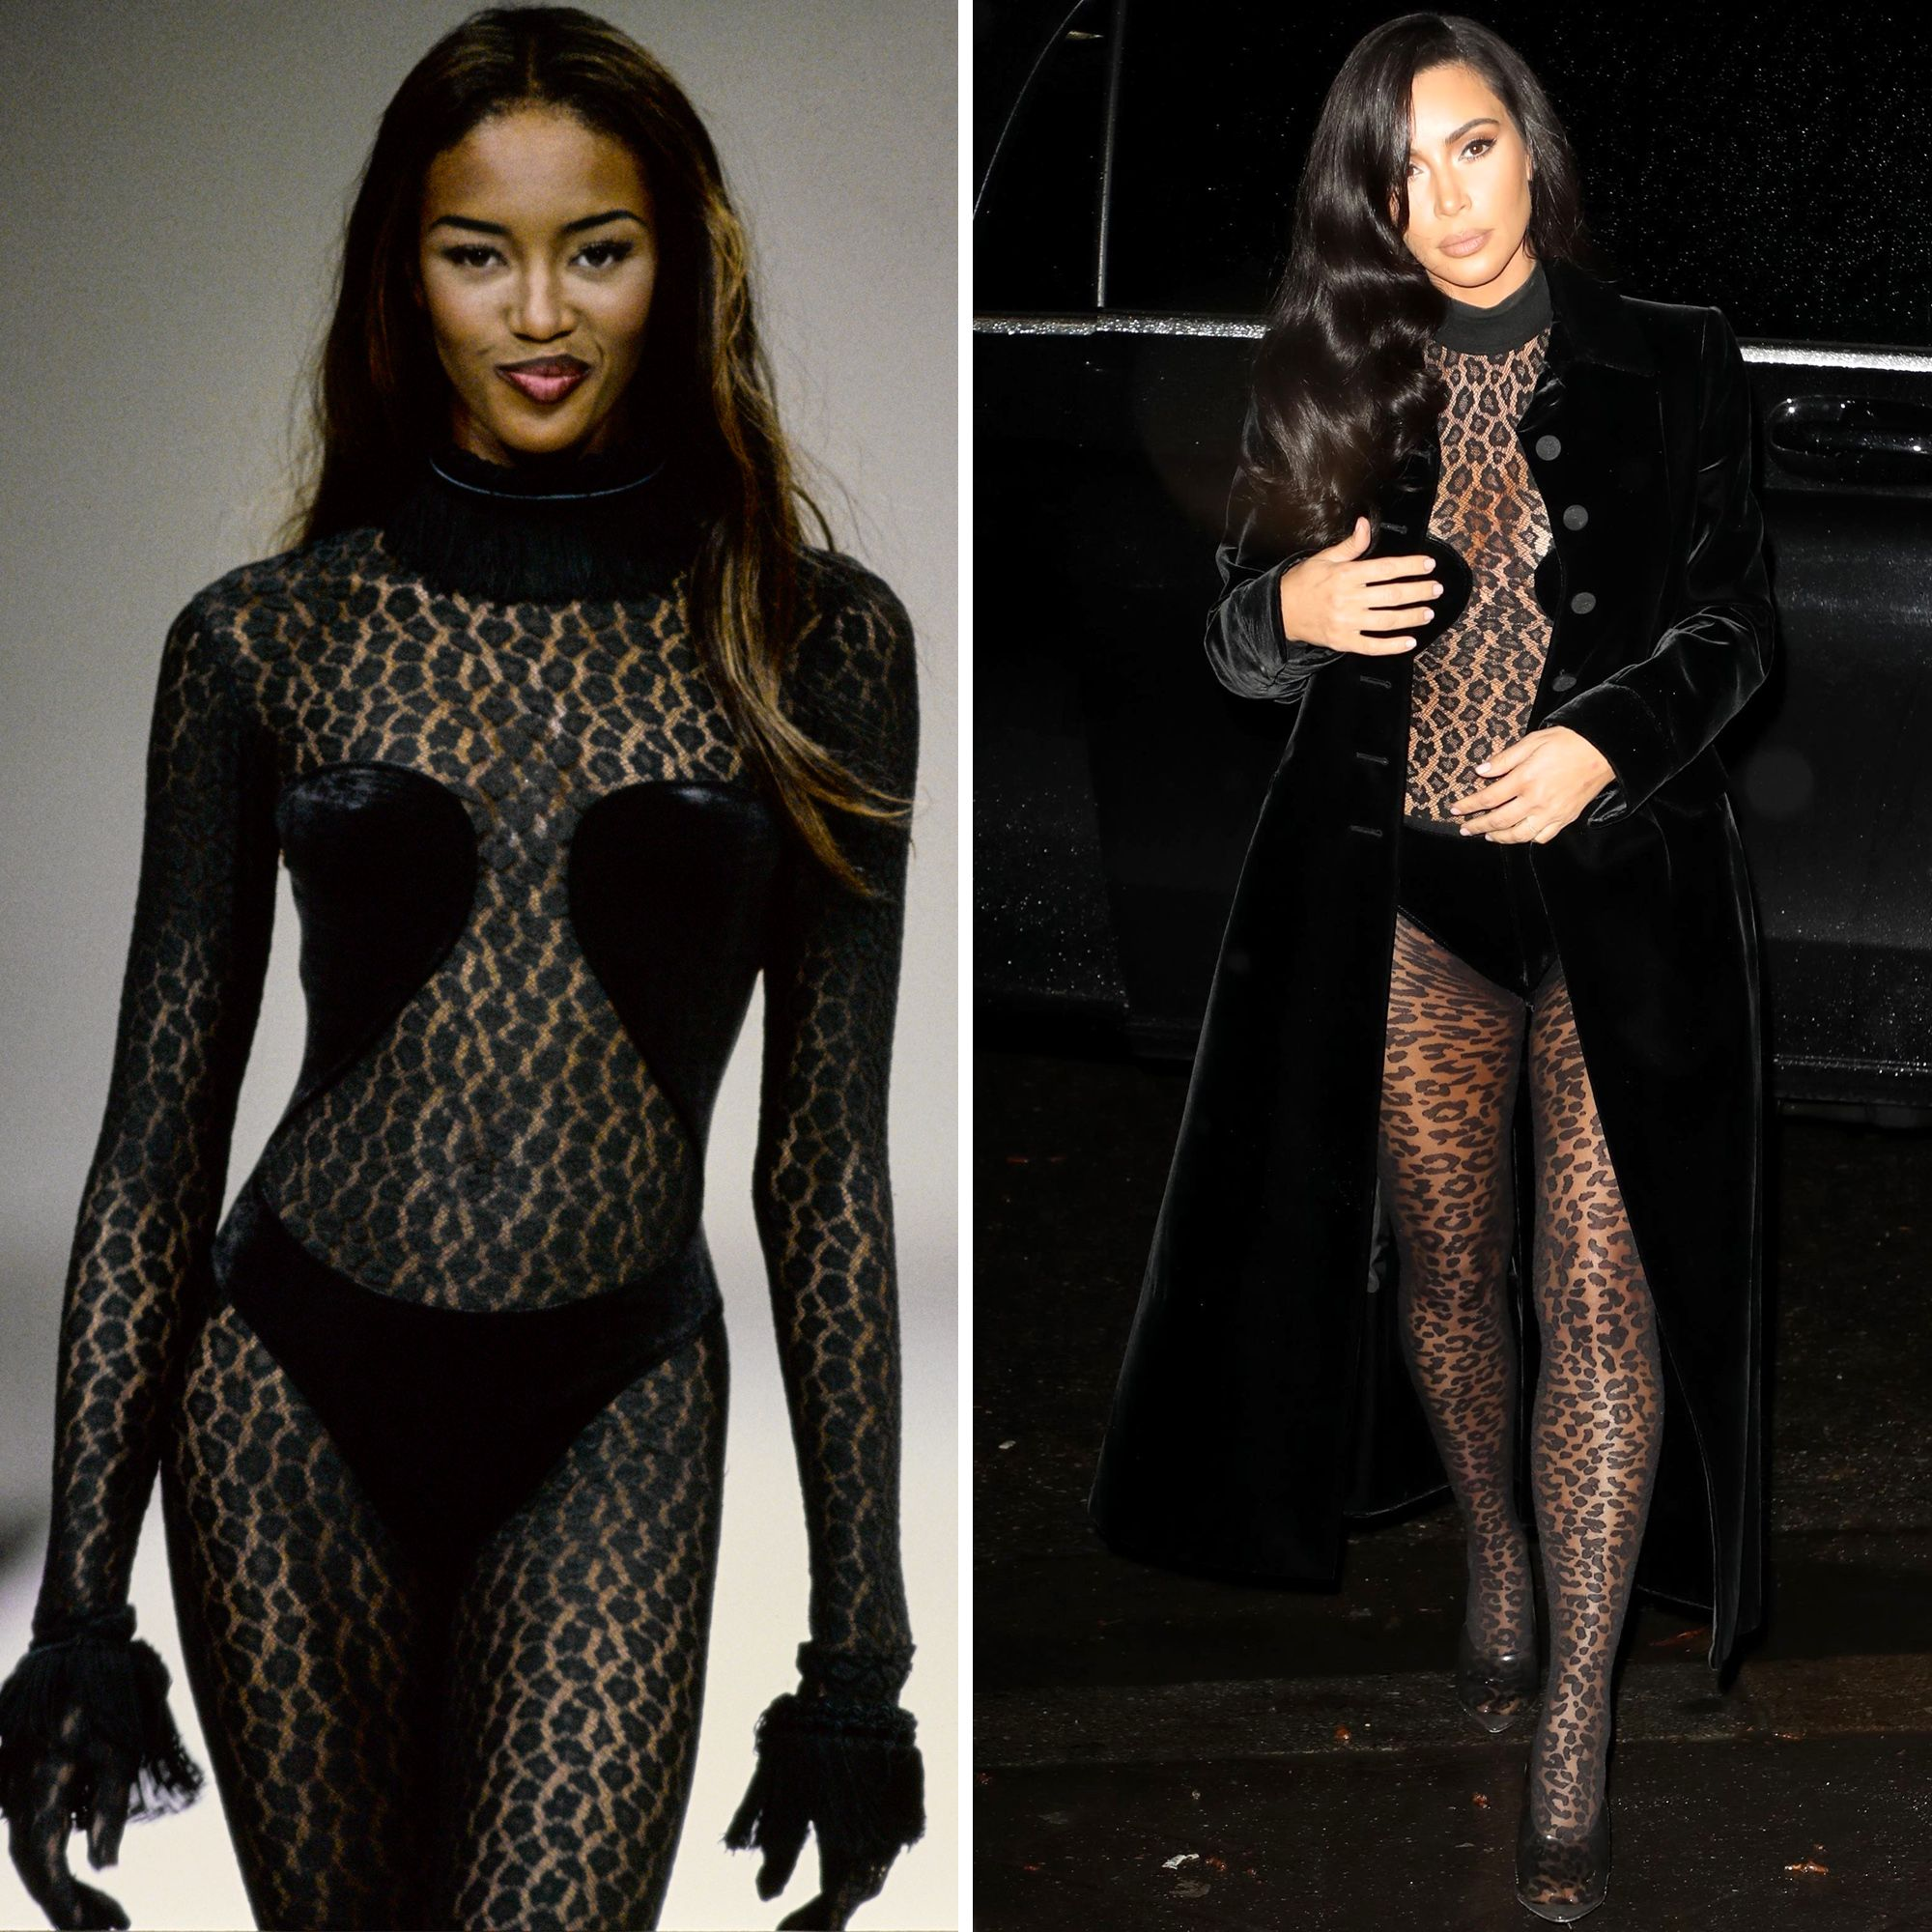 Kim Kardashian Keeps Copying Naomi Campbell's '90s Outfits and Fashion